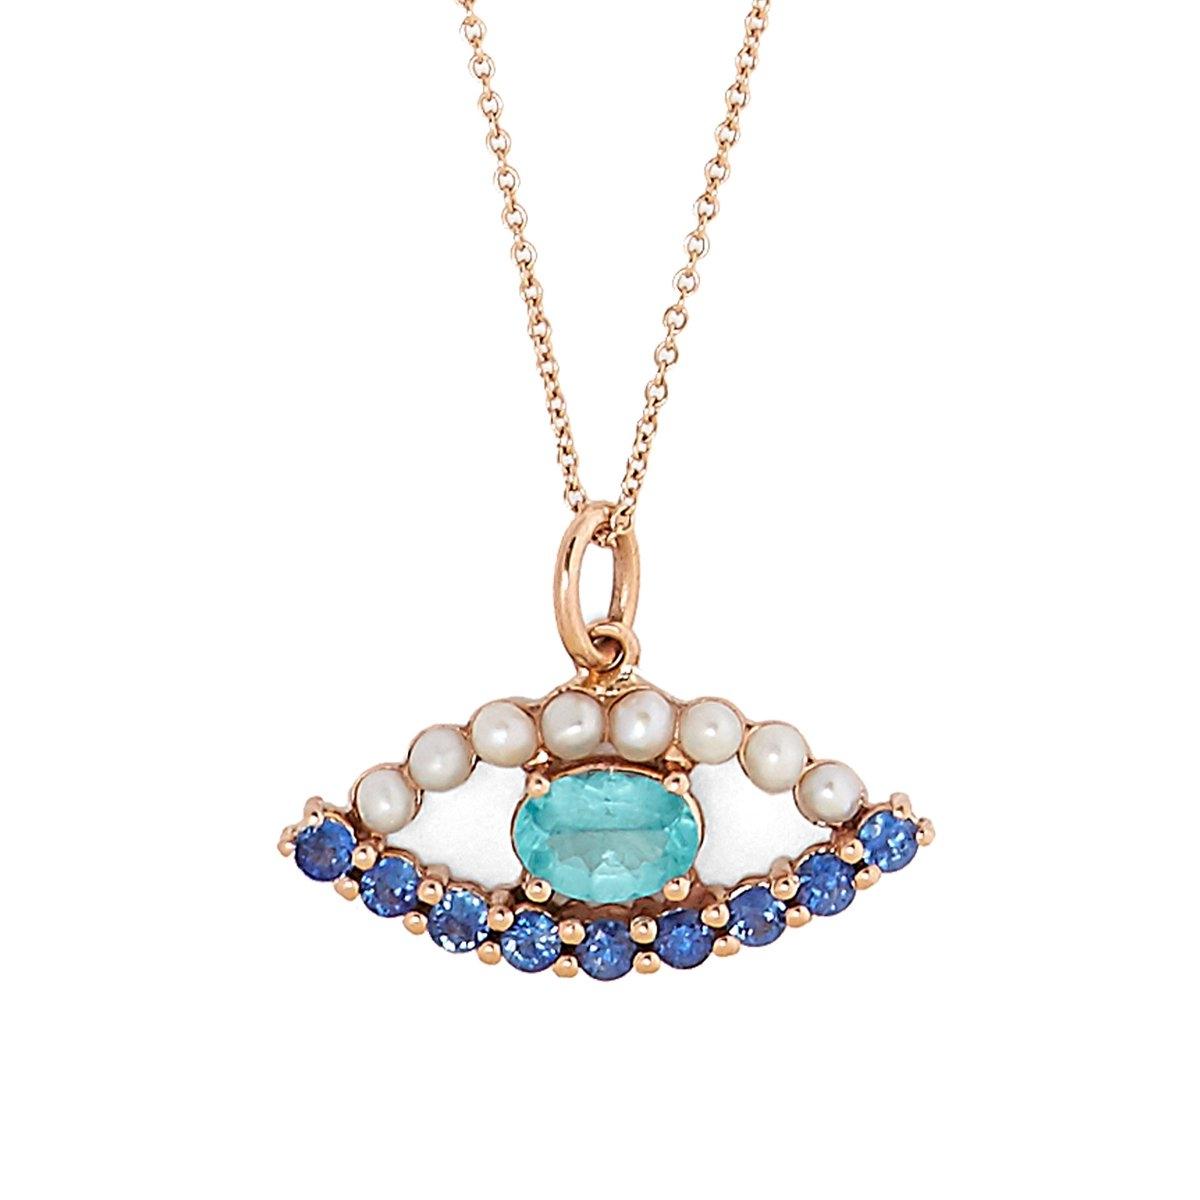 Ileana Makri - Jewelry